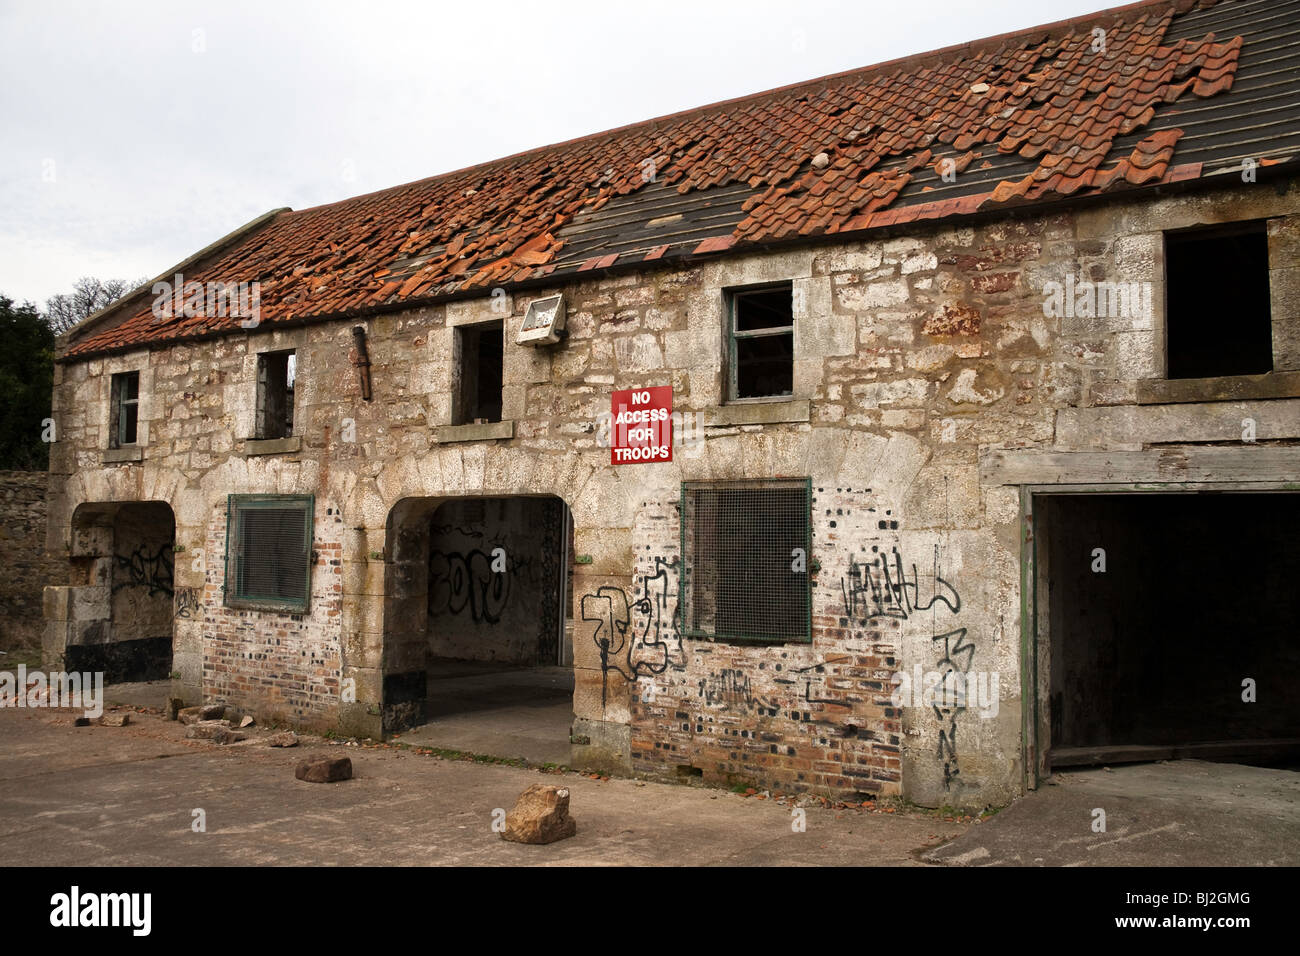 Rundown Building Decay Stock Photos Rundown: A Deserted, Run-down Building In A State Of Disrepair. A